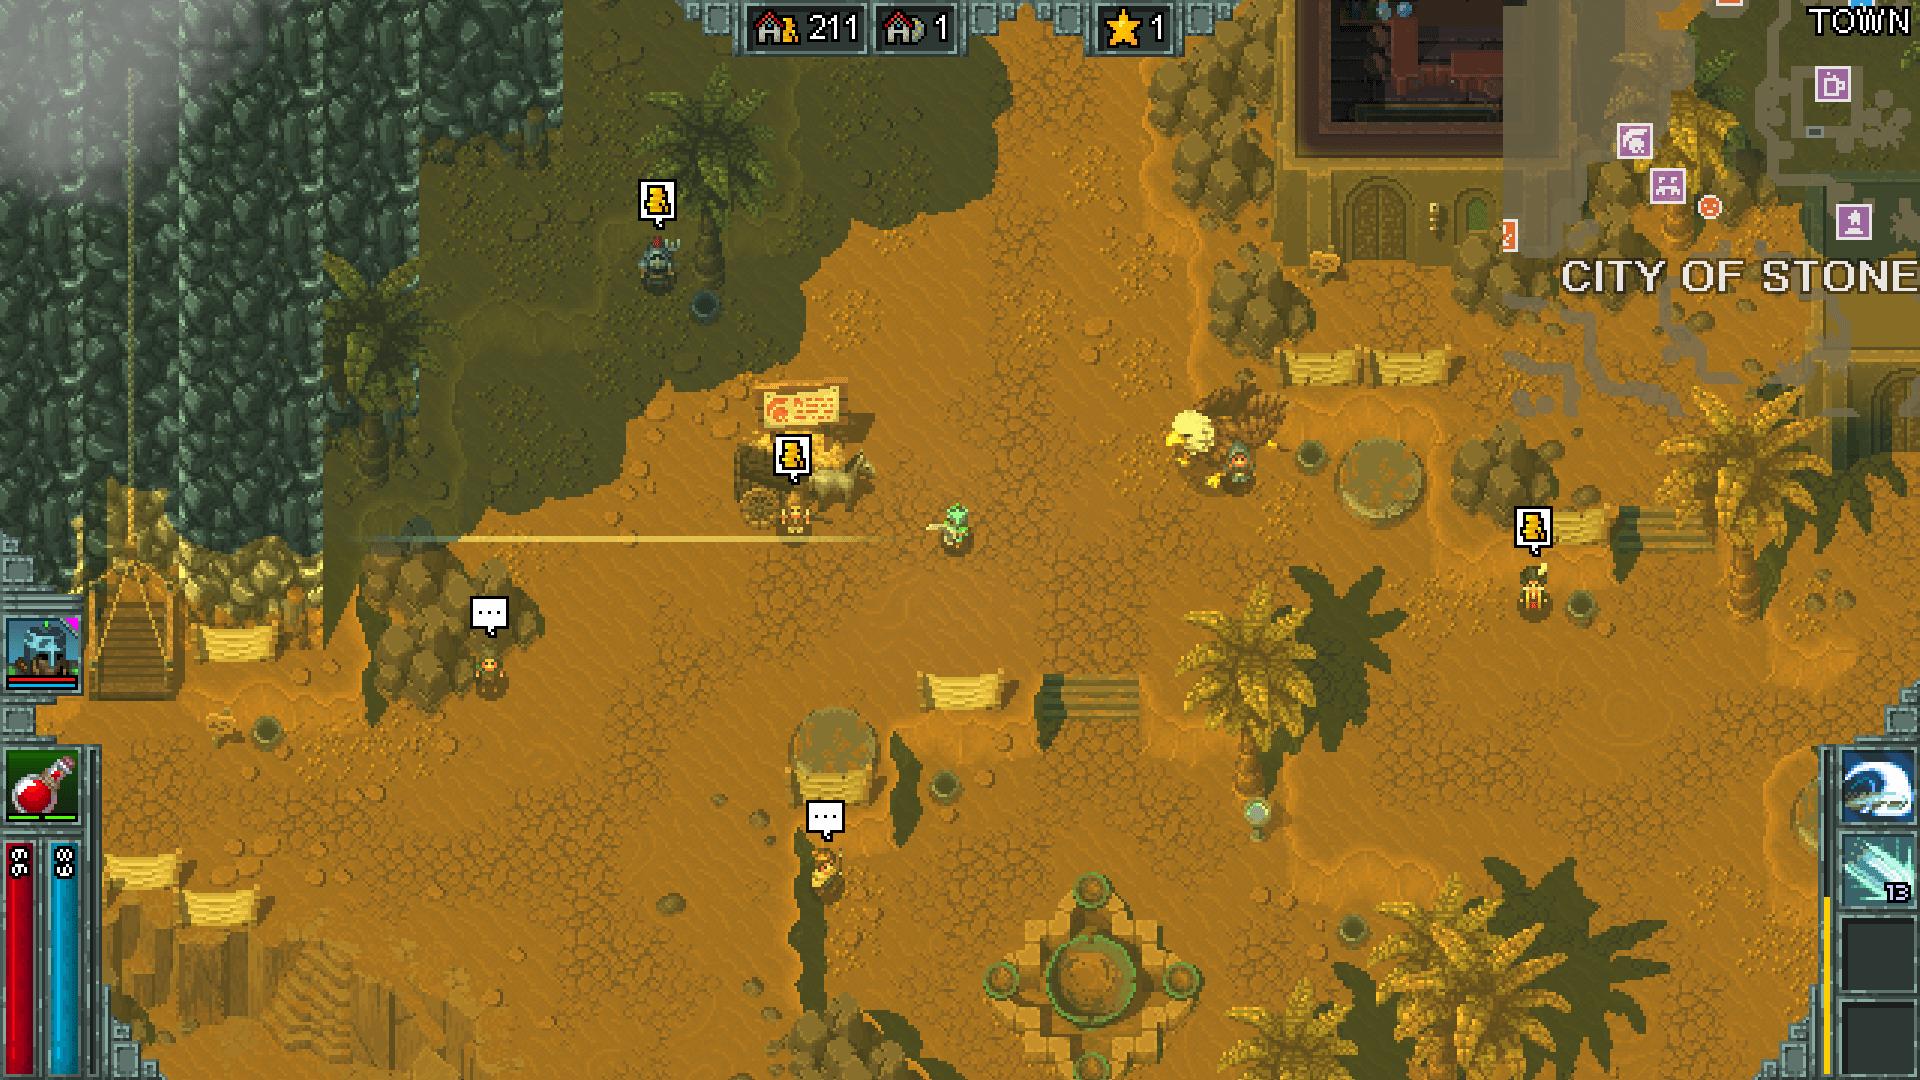 Heroes of Hammerwatch game screenshot, desert scene